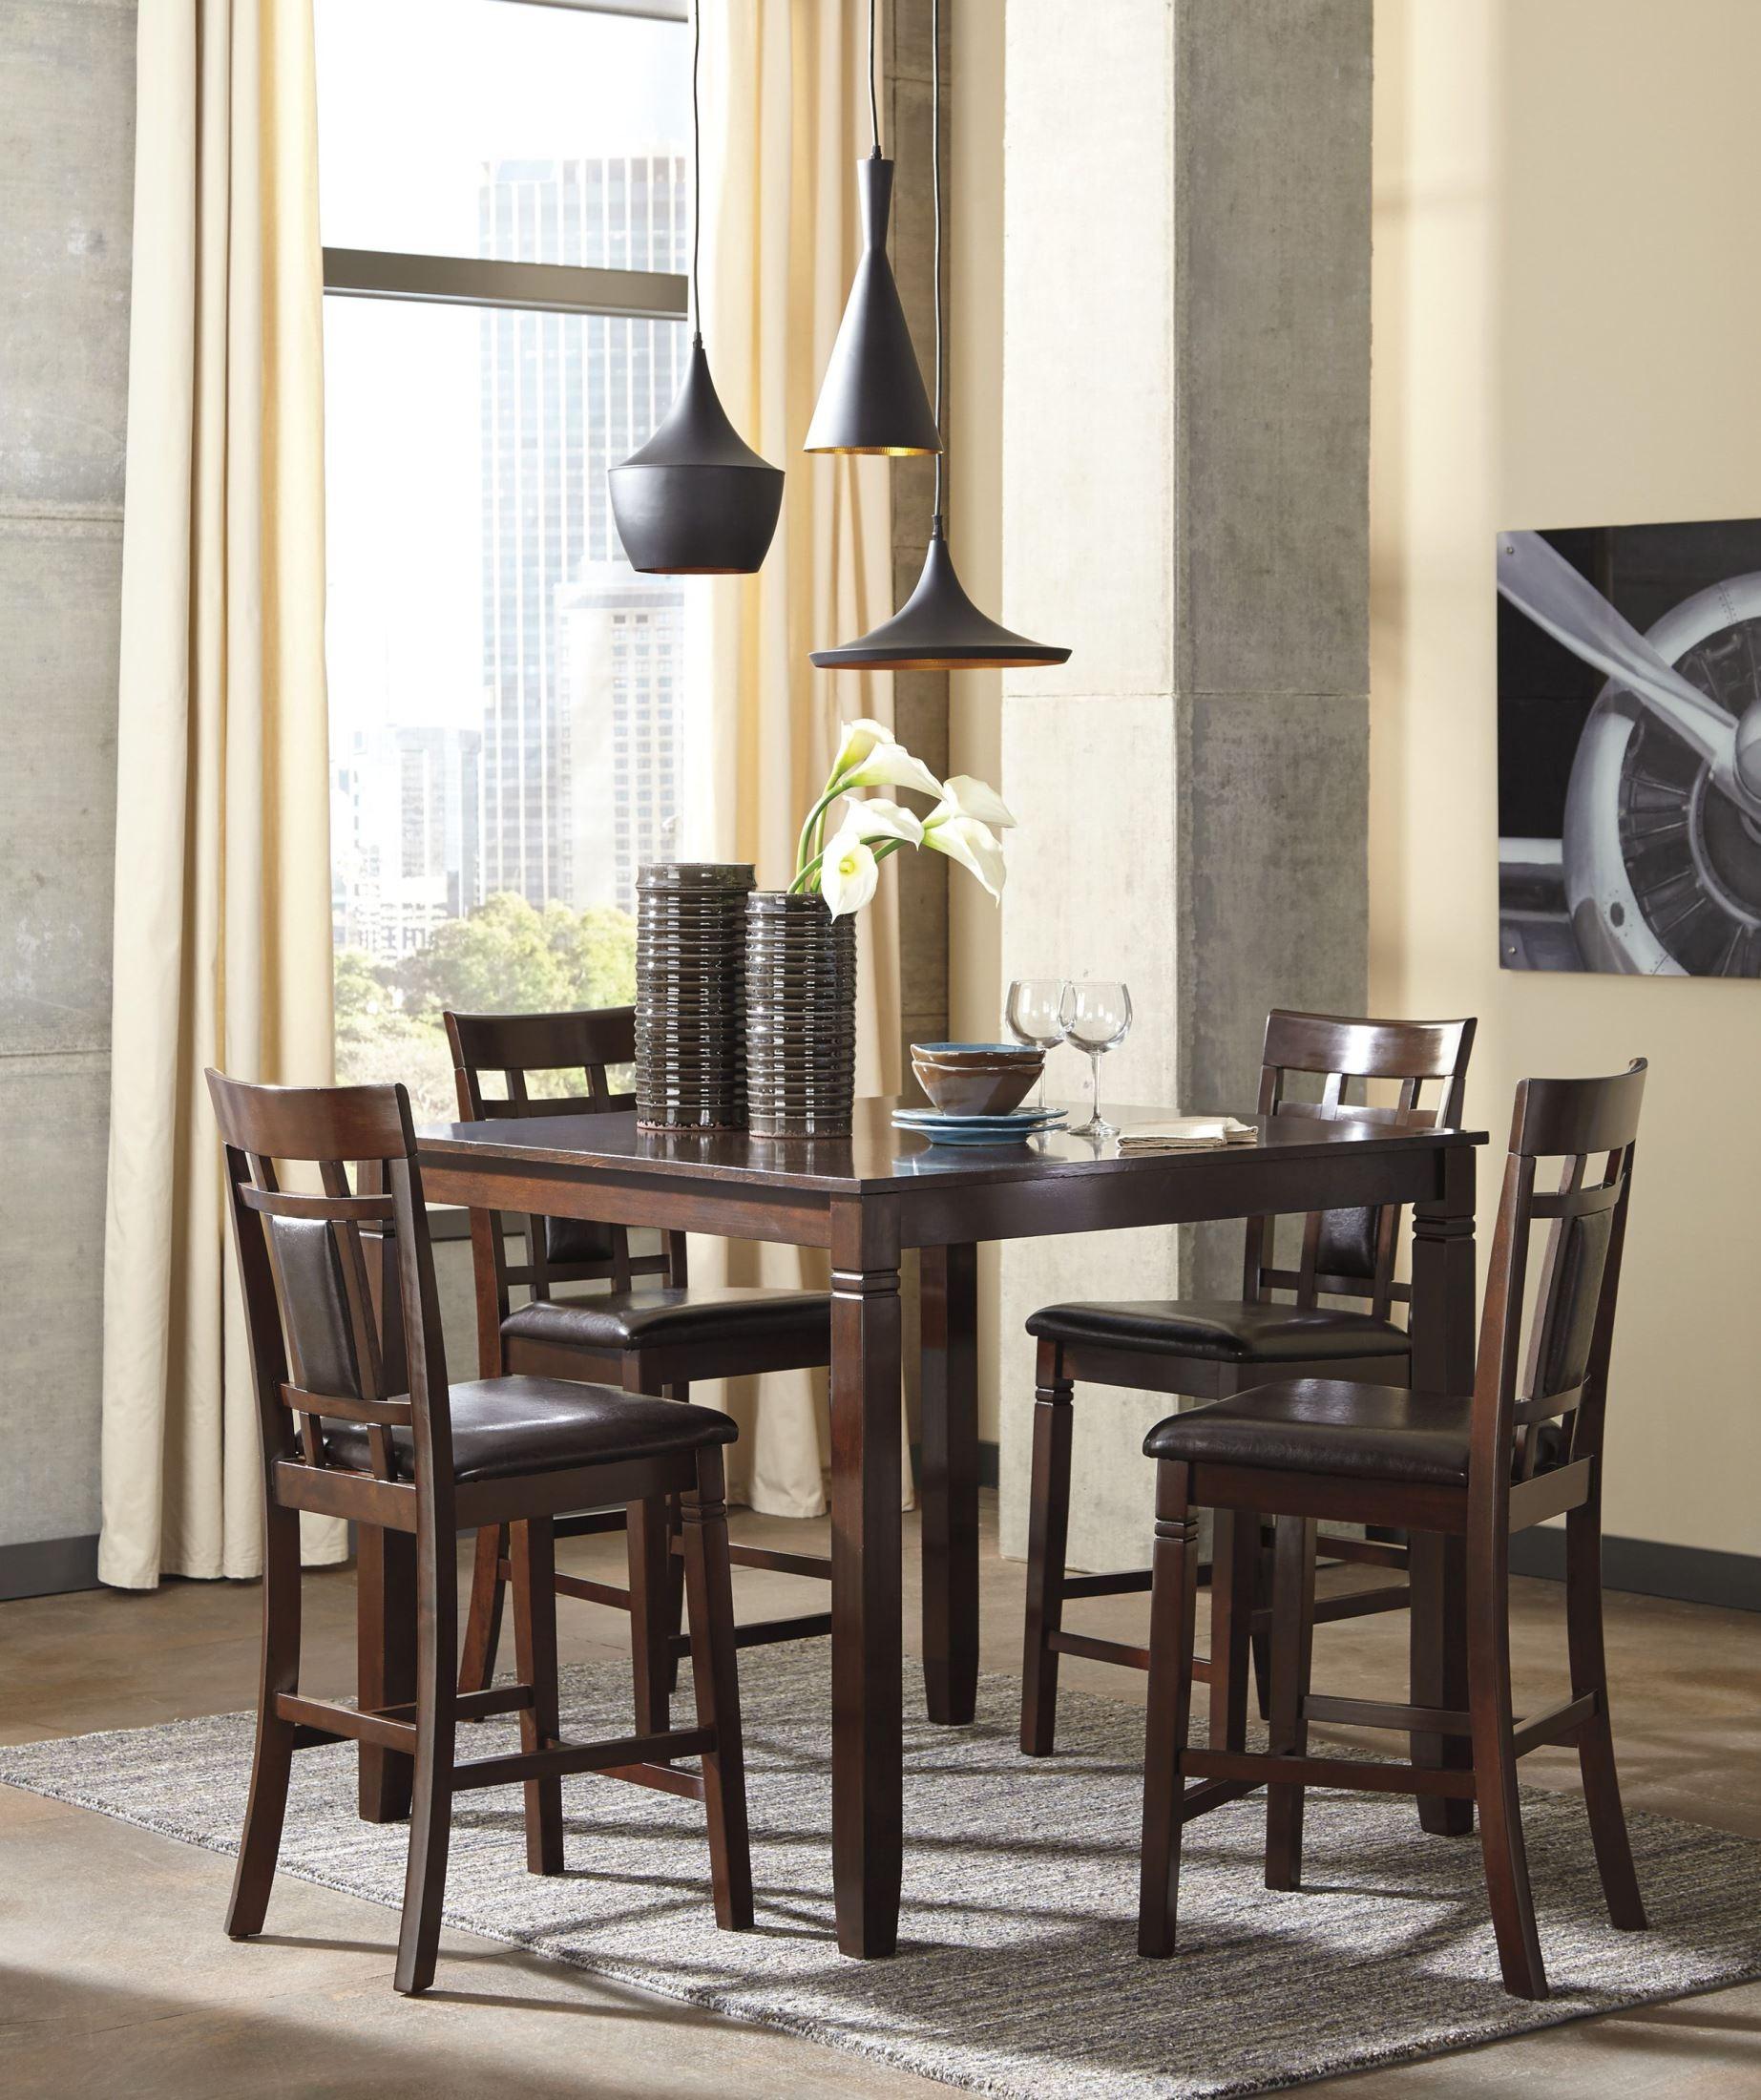 Bennox Brown 5 Piece Counter Height Dining Room Set, D384